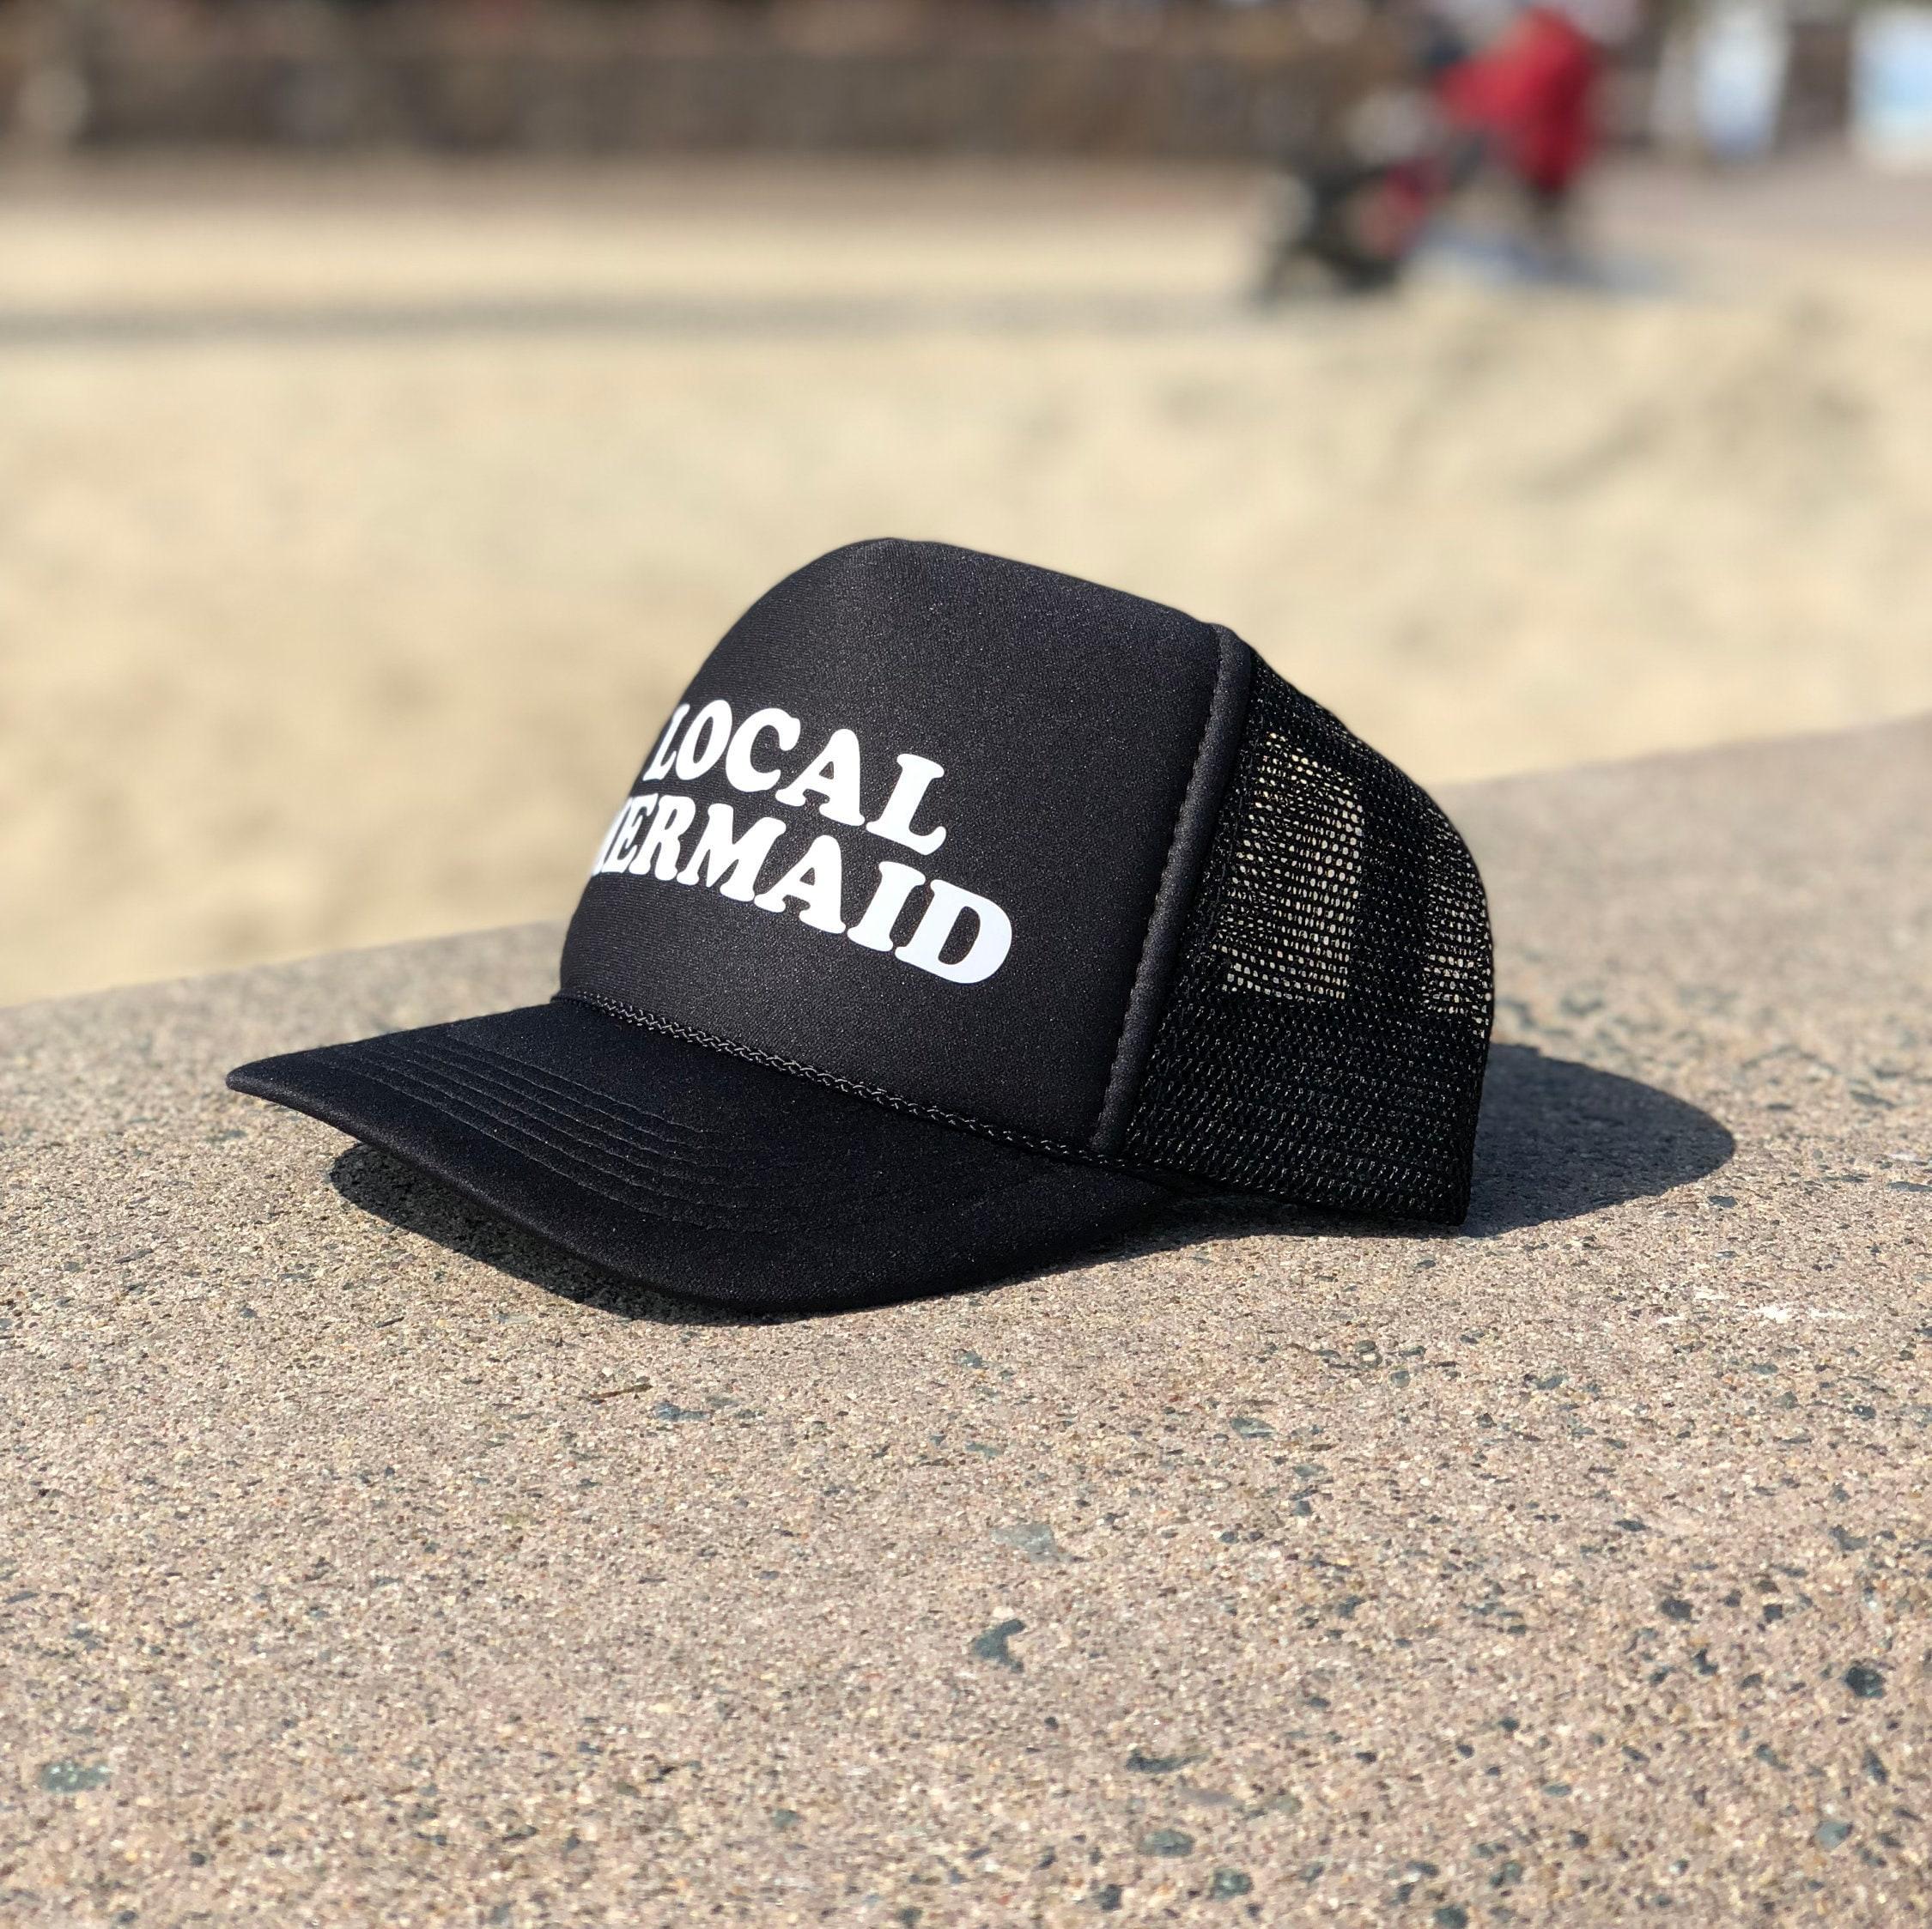 6ee71ec86ea Local Mermaid Youth Black Foam Trucker Hat, Summer Beach Hats For ...